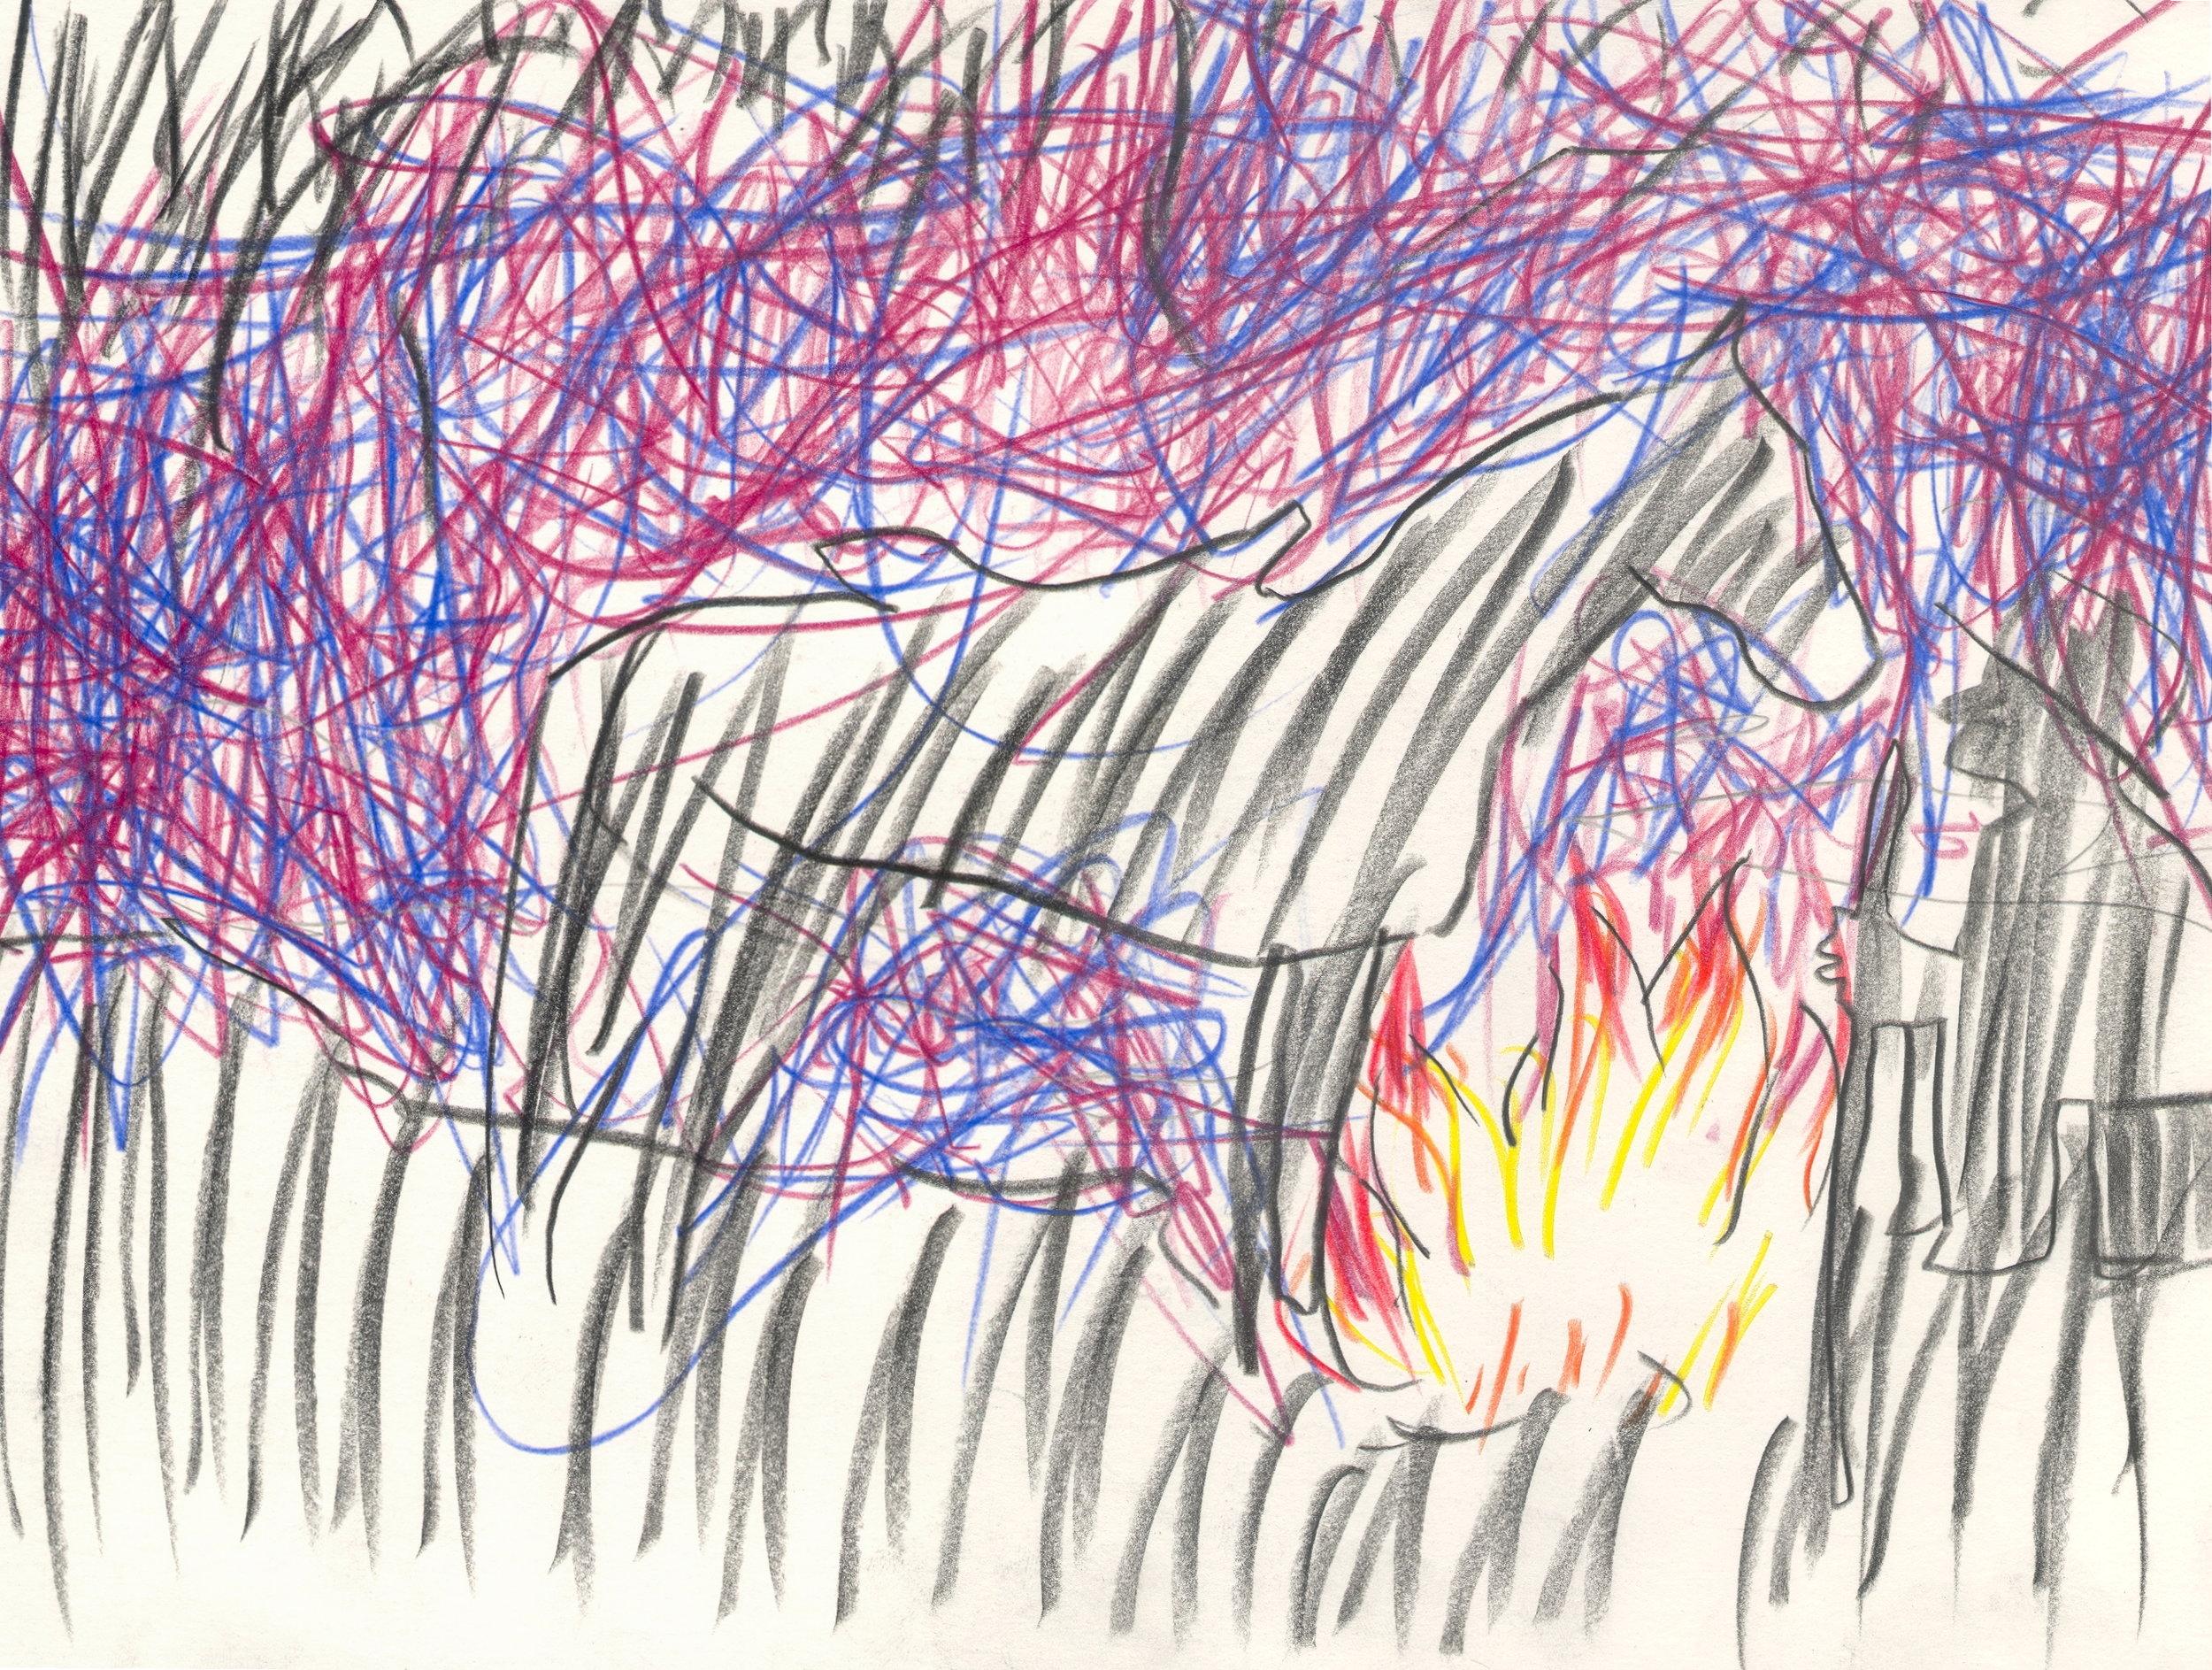 O.T. ( Serie Cowboys III ), 2016  Bleistift auf Papier, 26x35.5cm